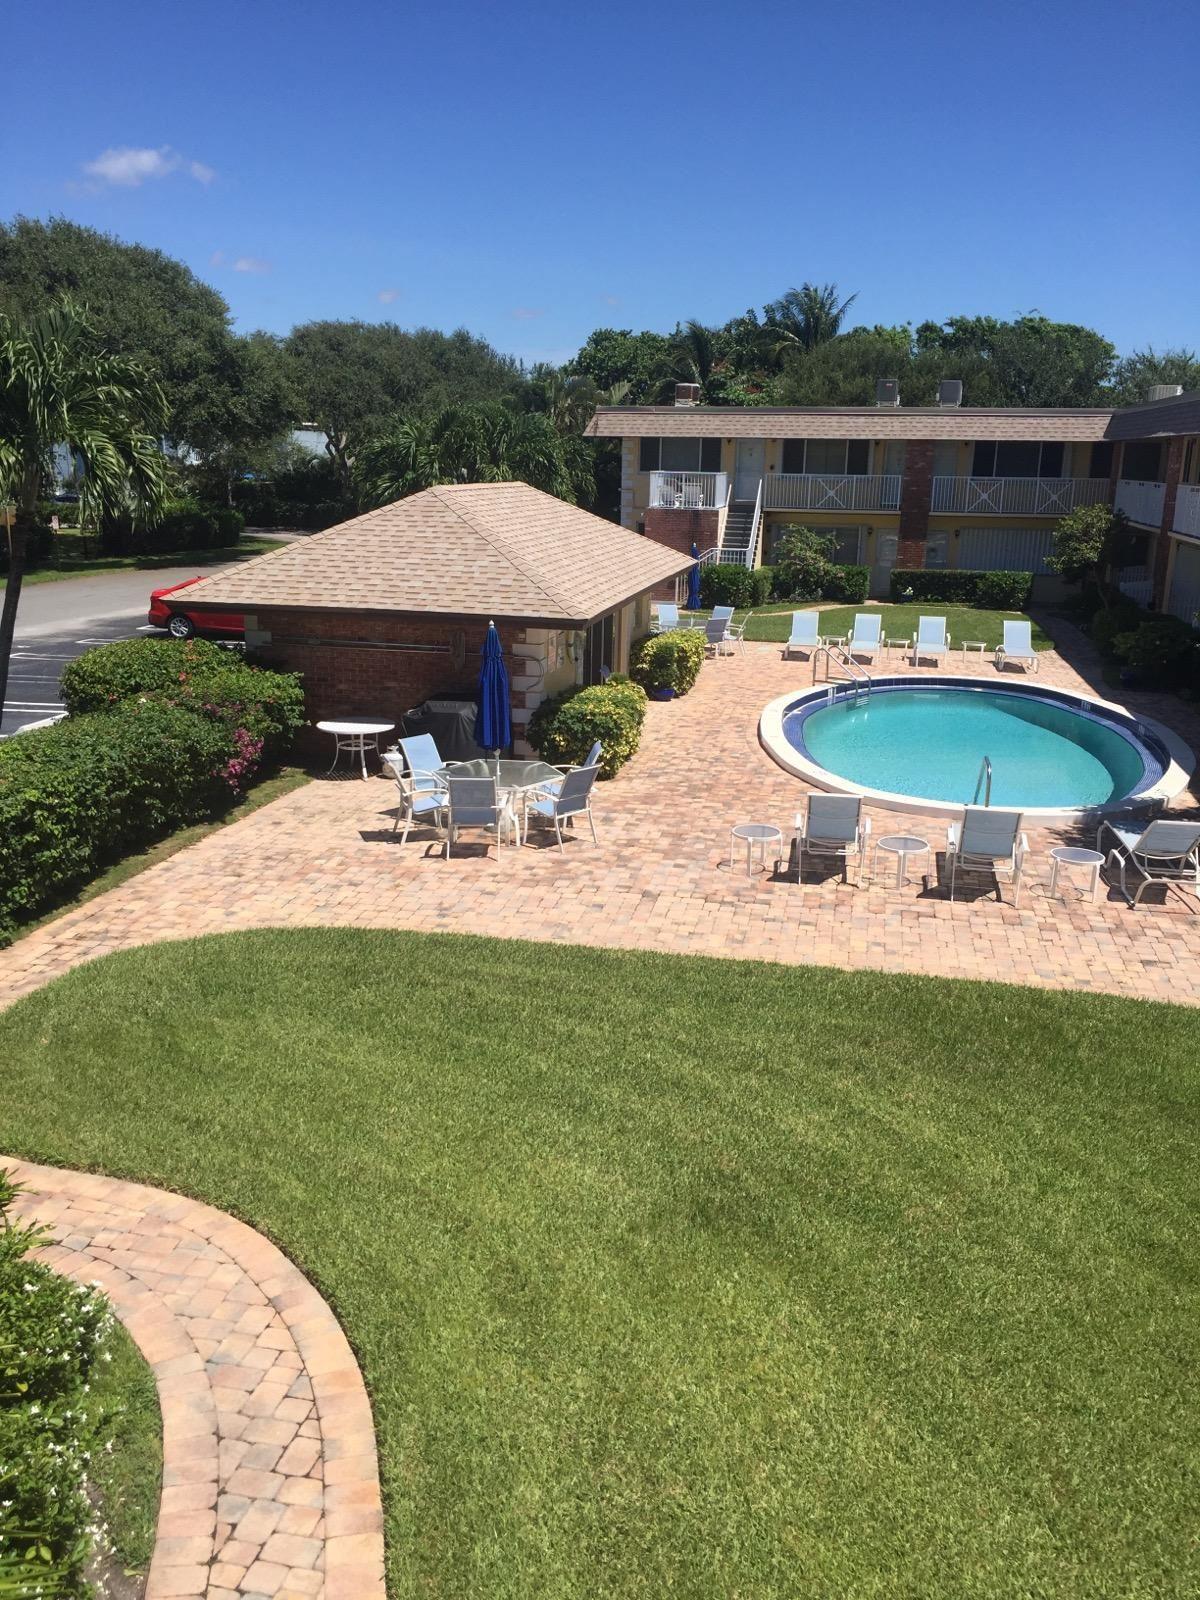 1001 Ne 8th Ave. #216, Delray Beach, FL 33483 - MLS#: RX-10623260